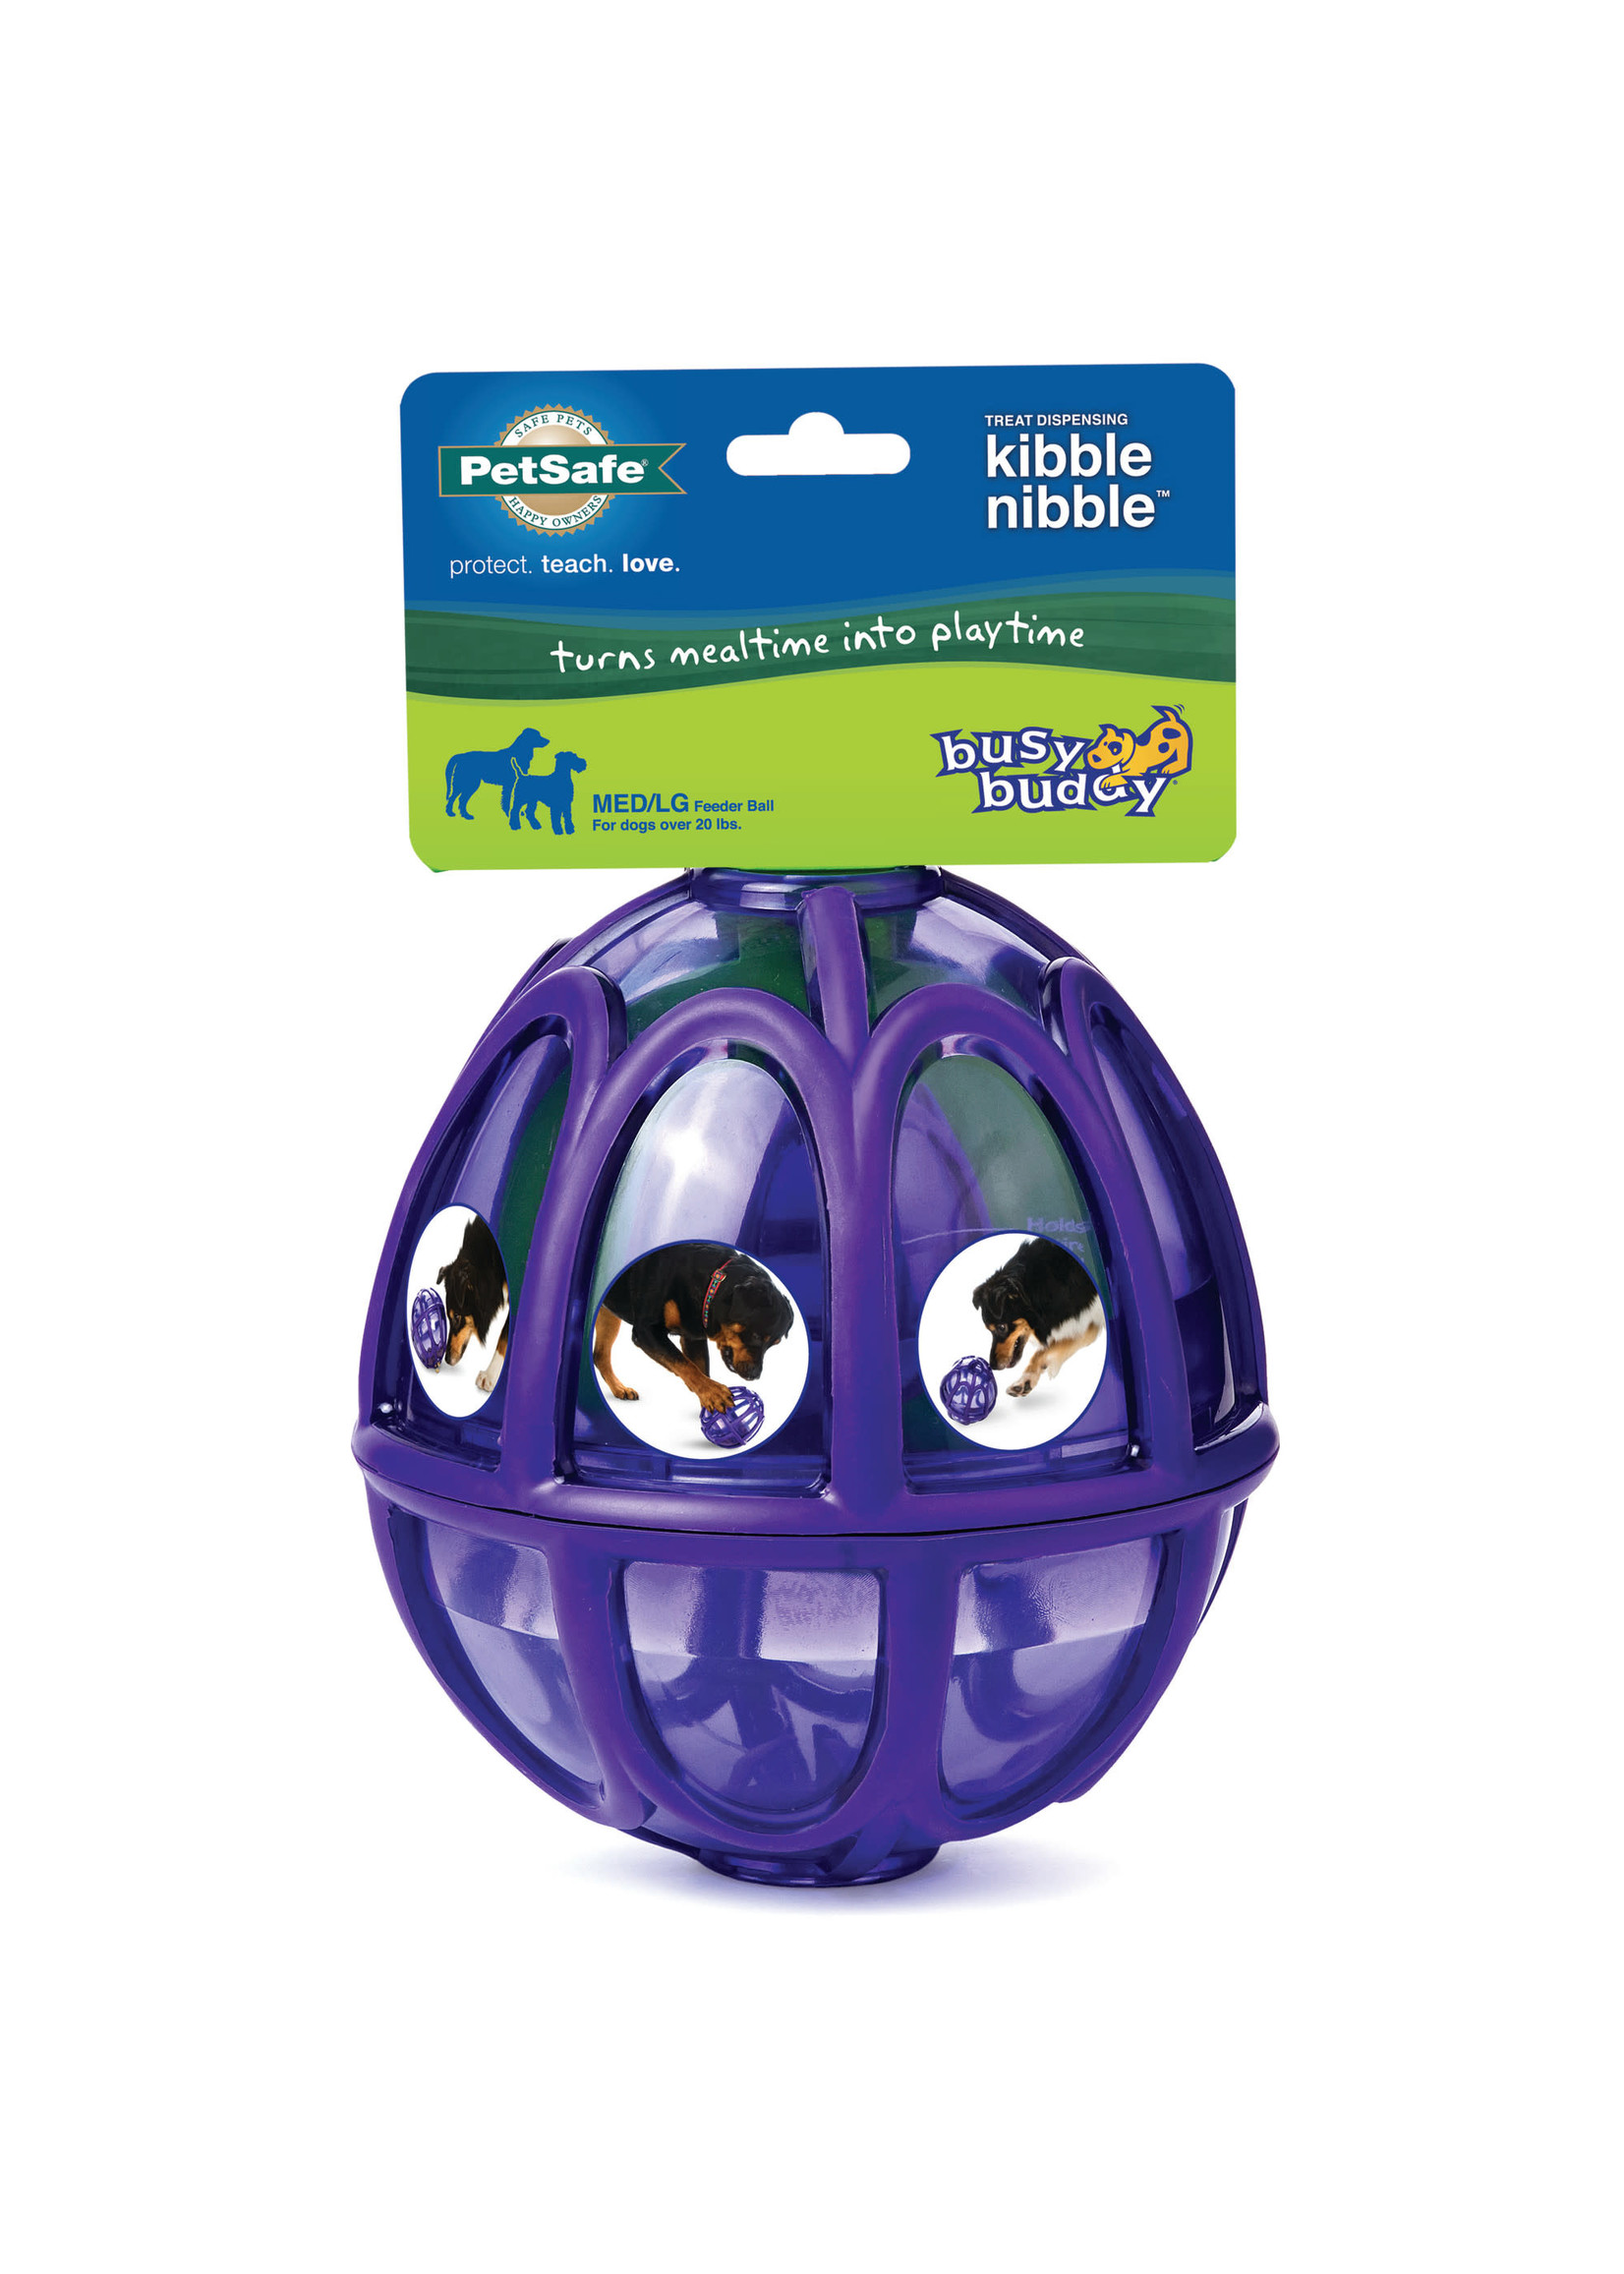 PetSafe PetSafe Busy Buddy Kibble Nibble XS/S